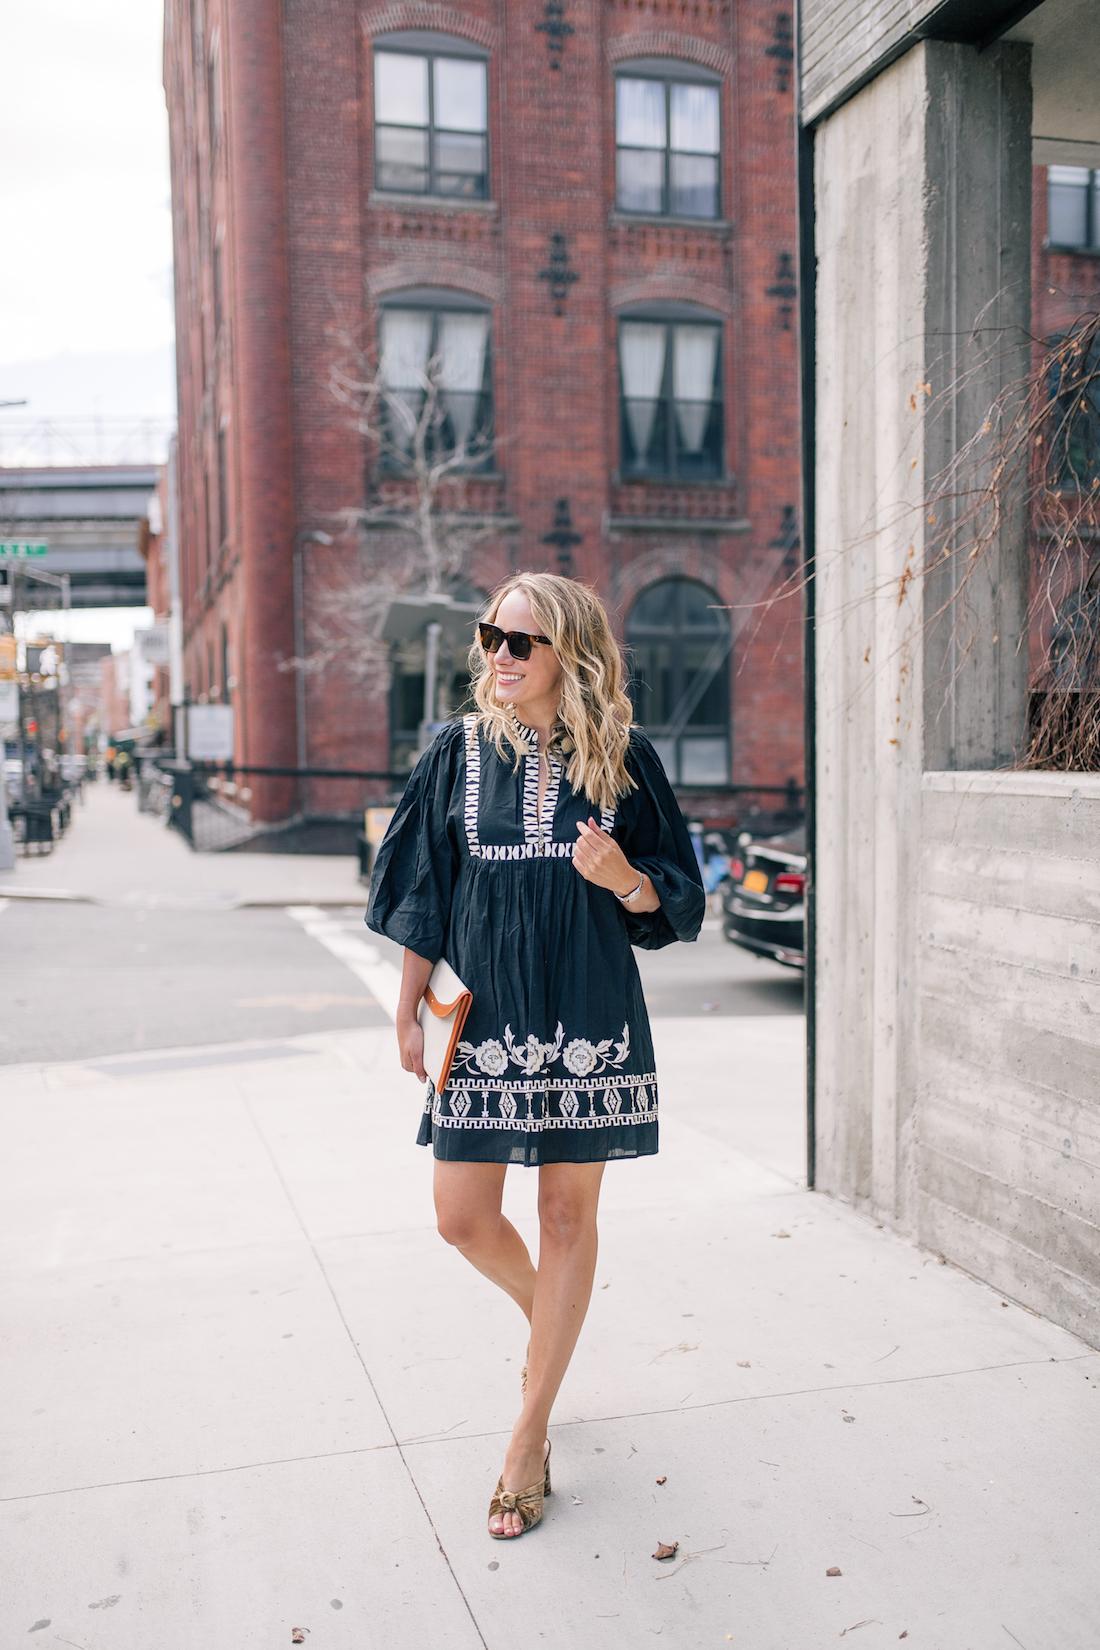 Grace Atwood's outfit:Figue Dress // Loeffler Randall Heels // Mansur Gavriel Clutch // Celine Sunglasses